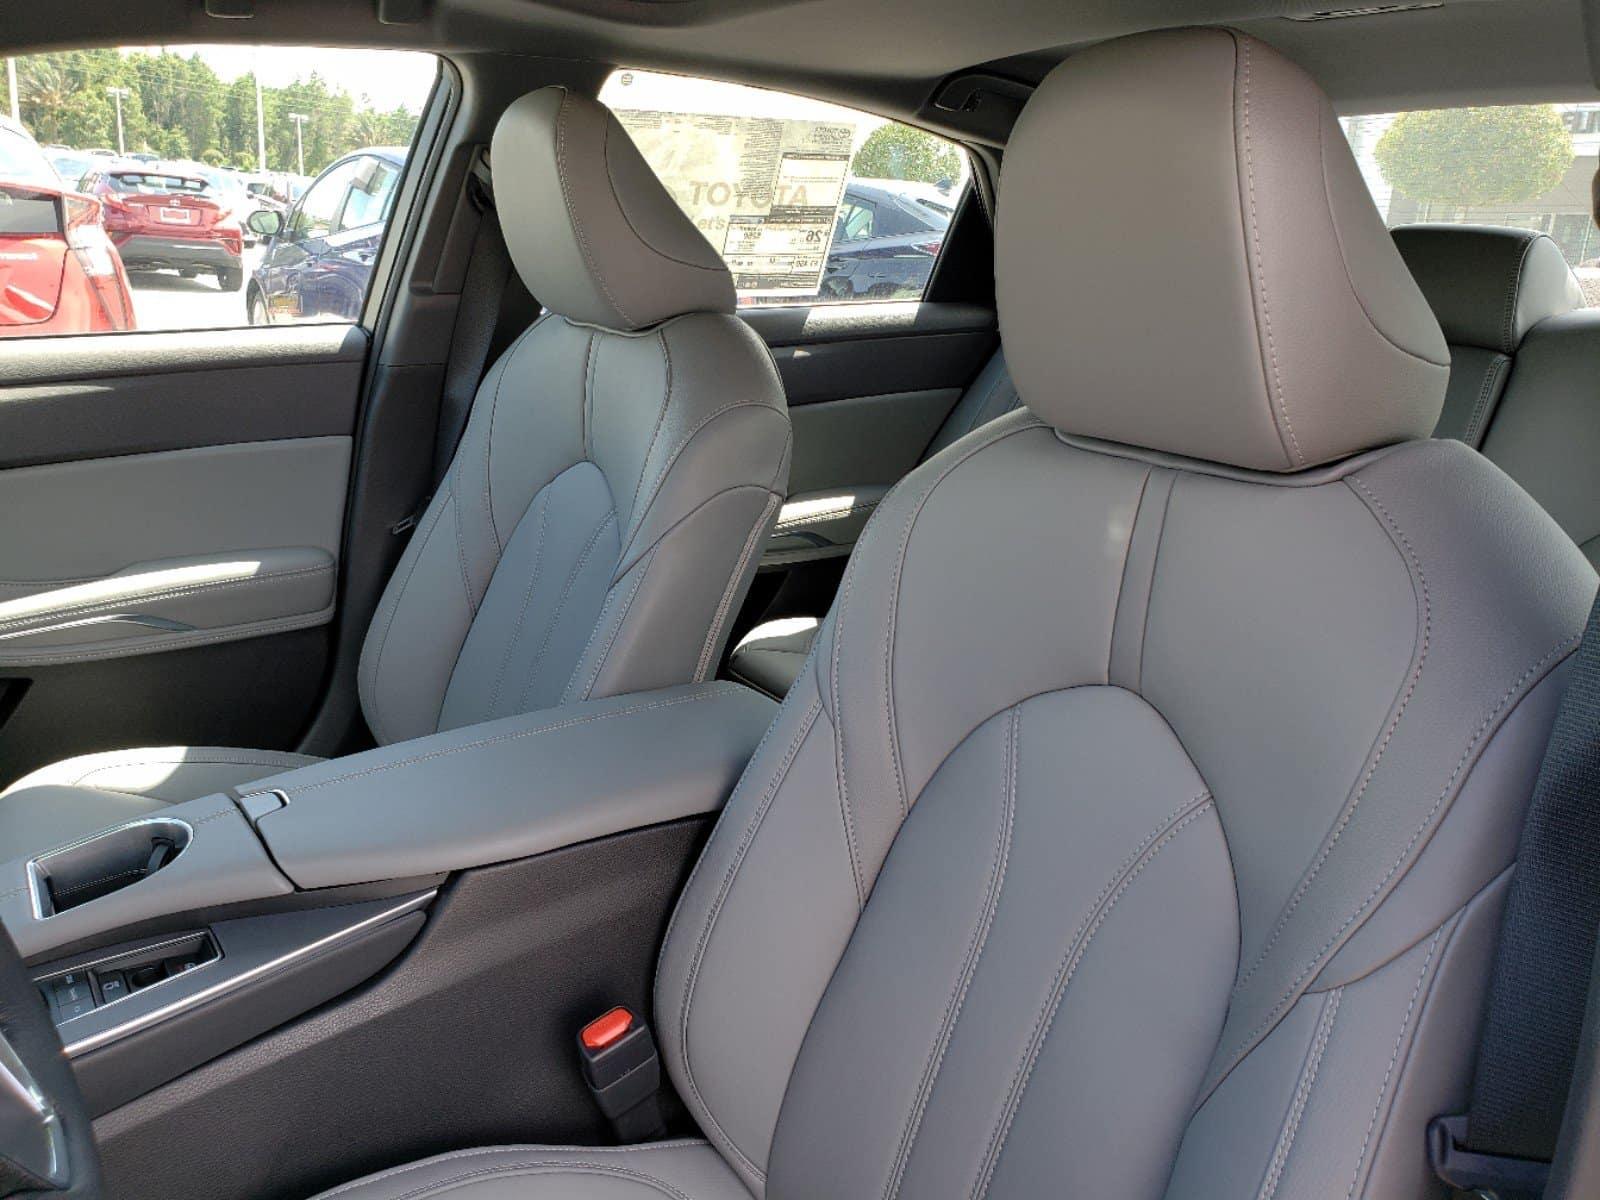 2019 Orlando Toyota Avalon.